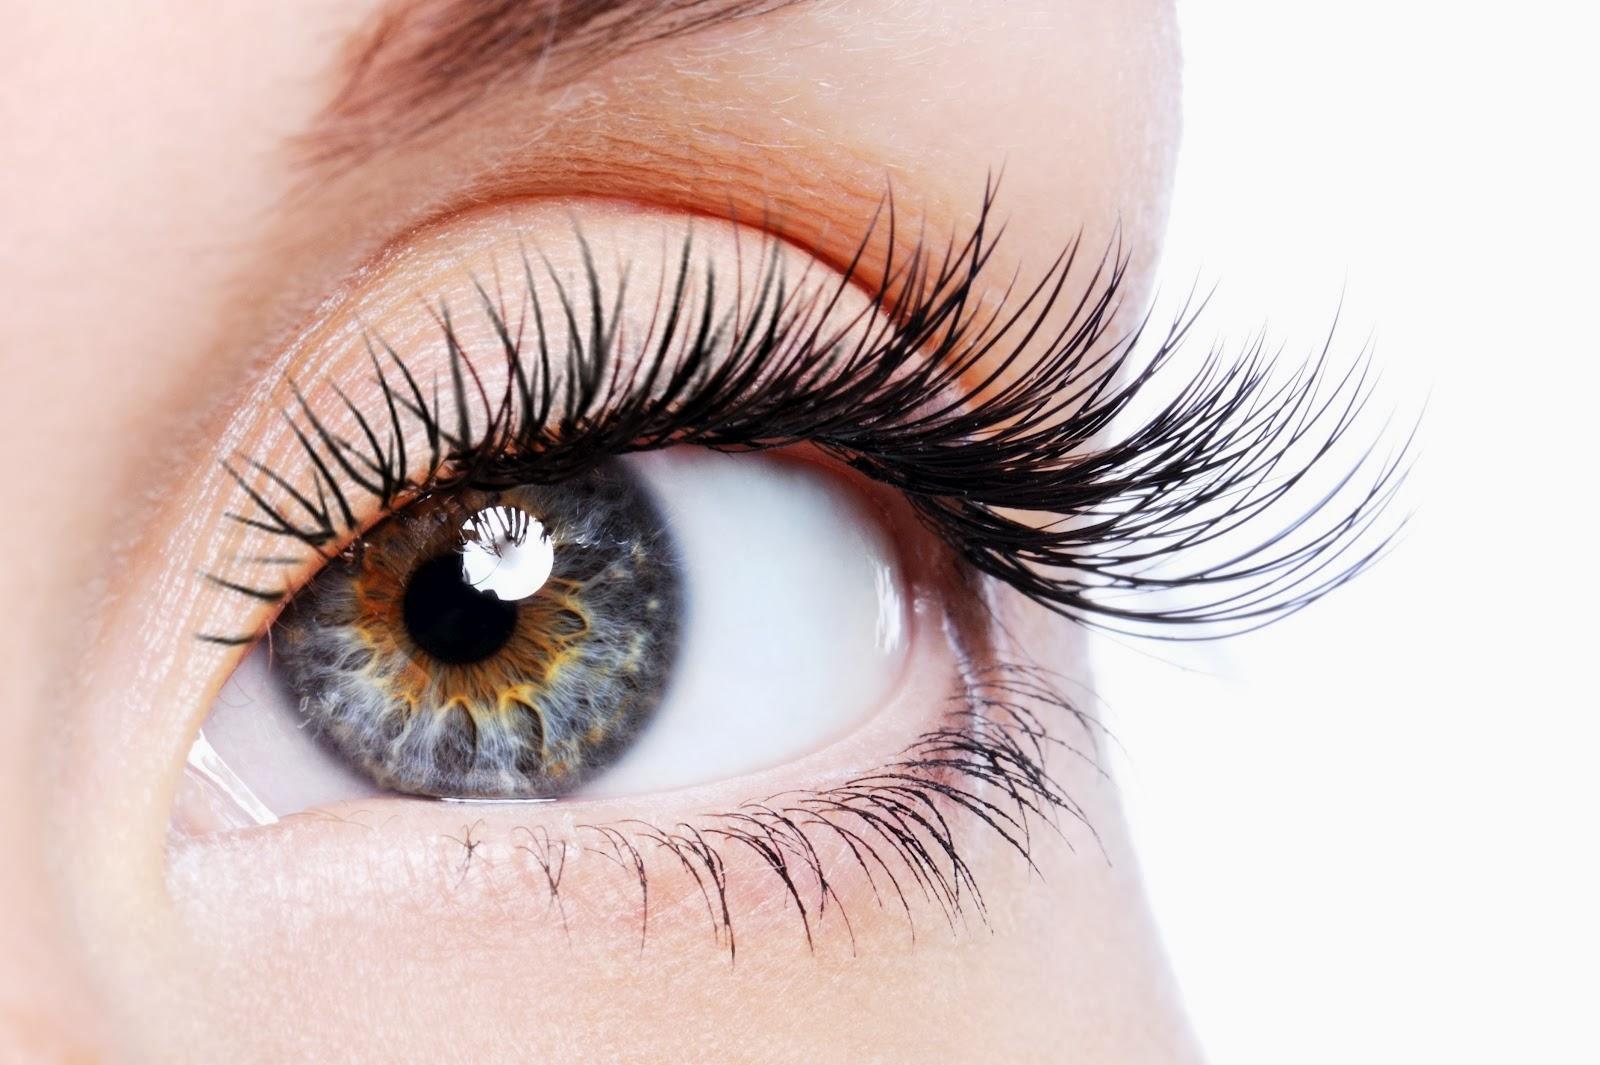 5 Cara Menjaga Mata Agar Tetep Sehat dan Bersih